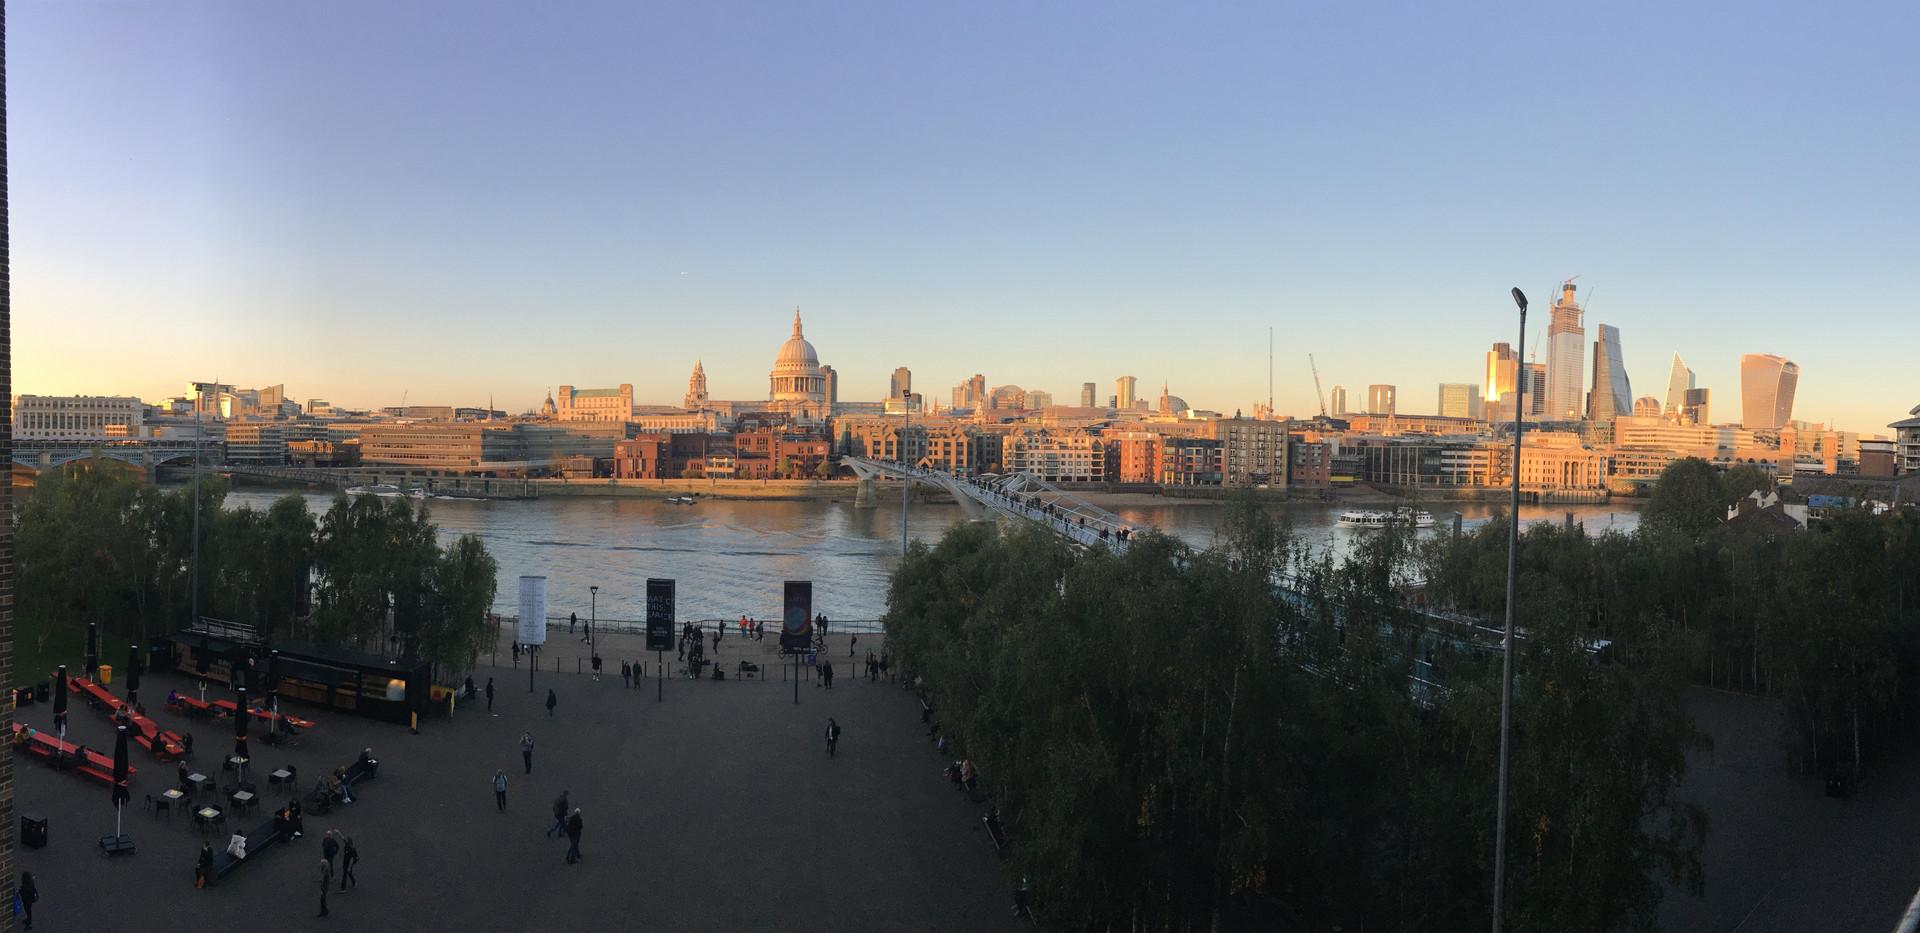 Landscape photo of London